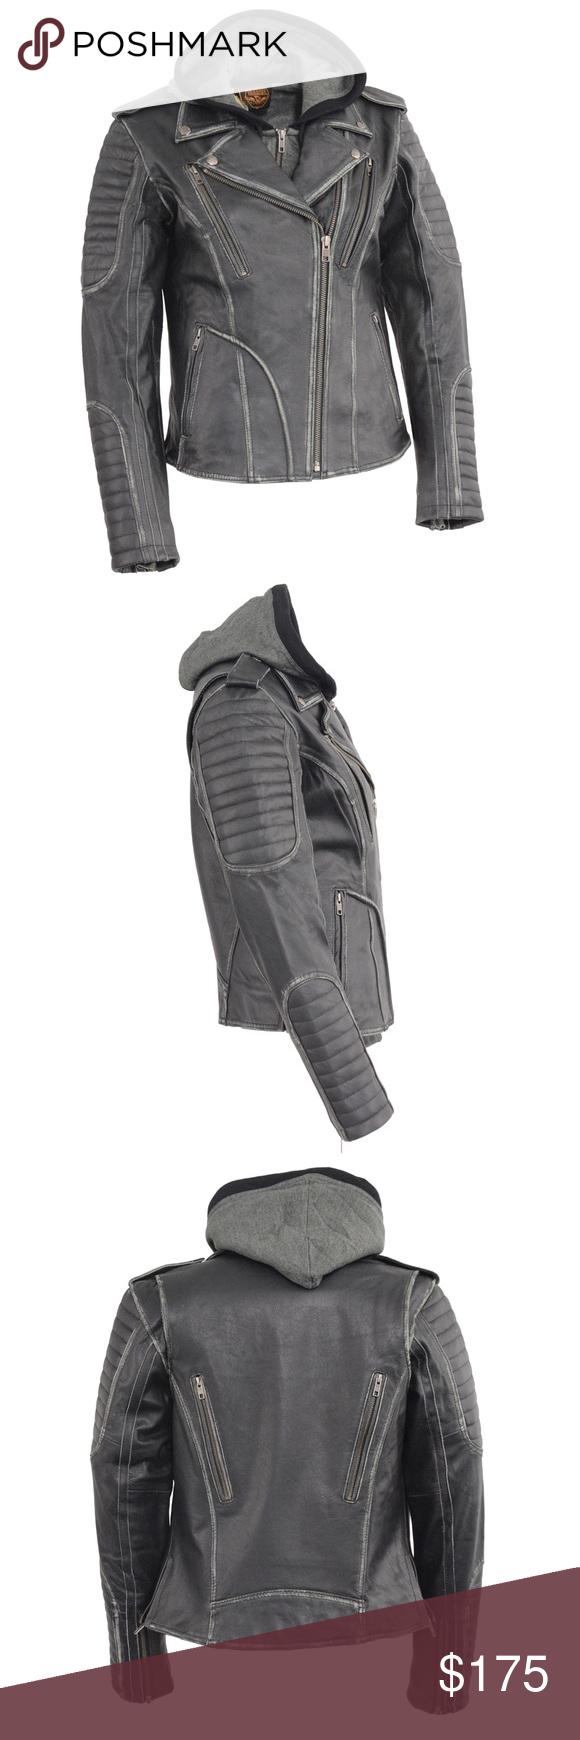 sold on ebay Leather hoodie, Leather jacket, Hoodies